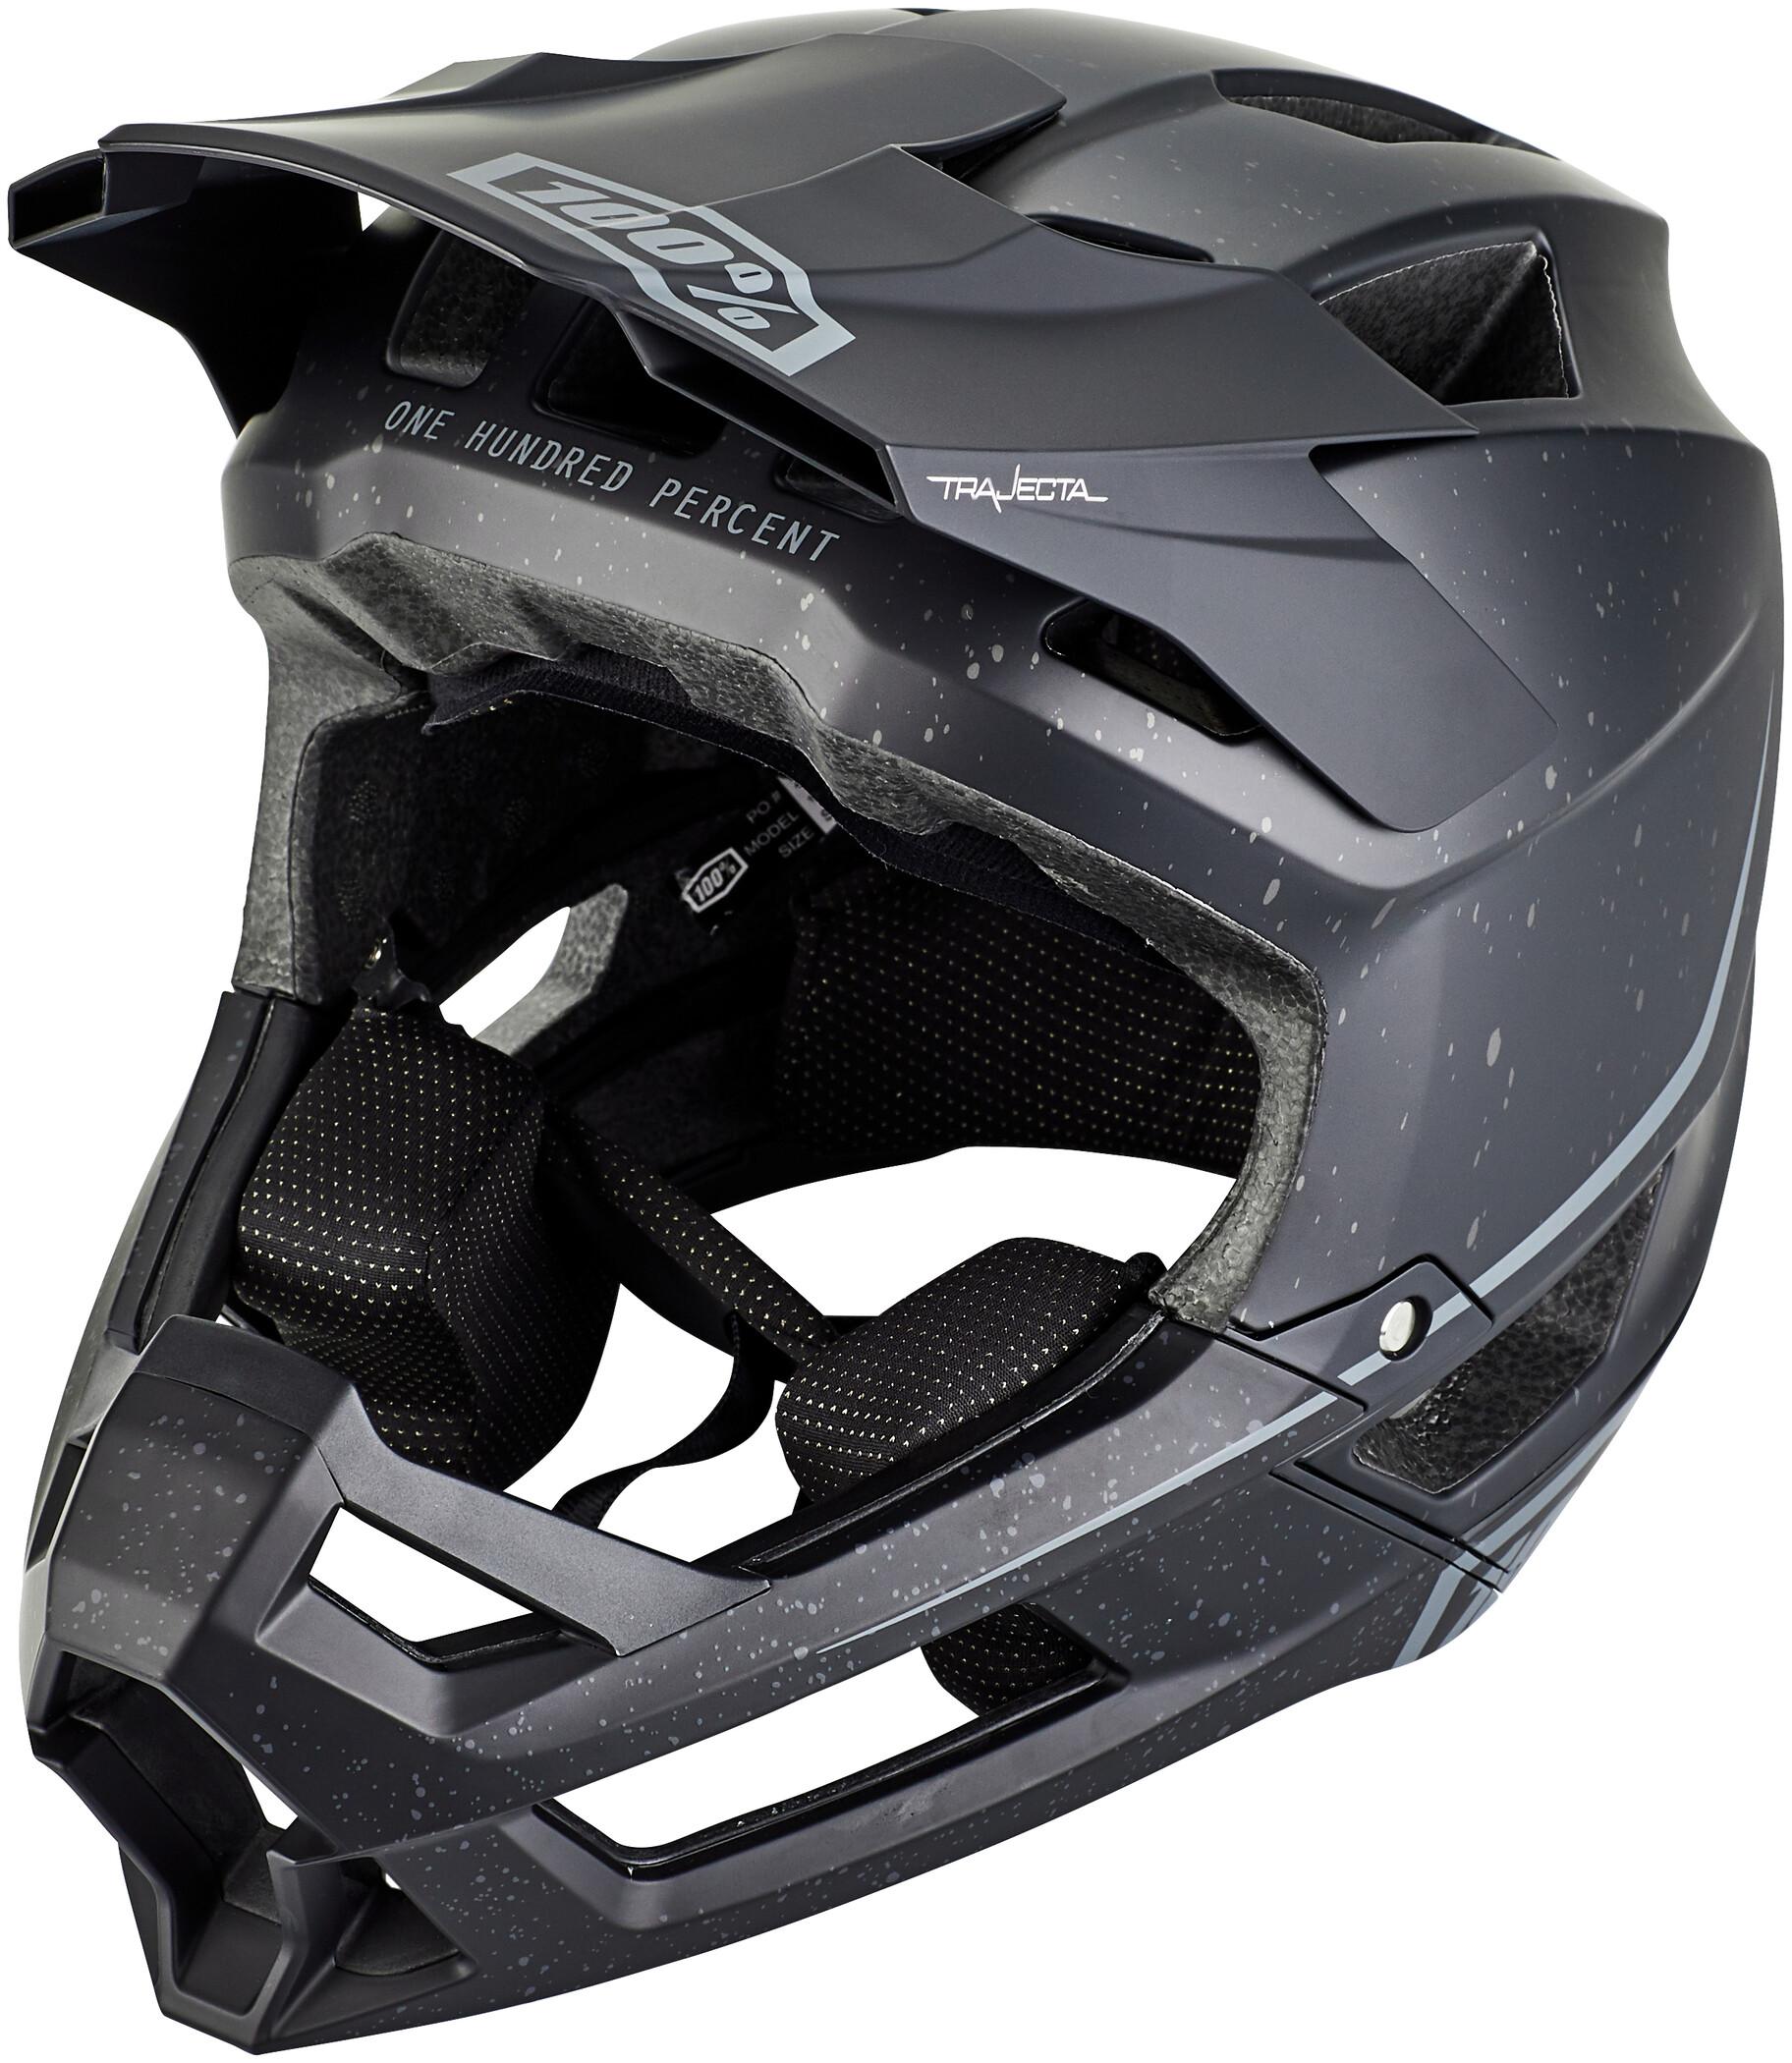 100% - Trajecta   bike helmet